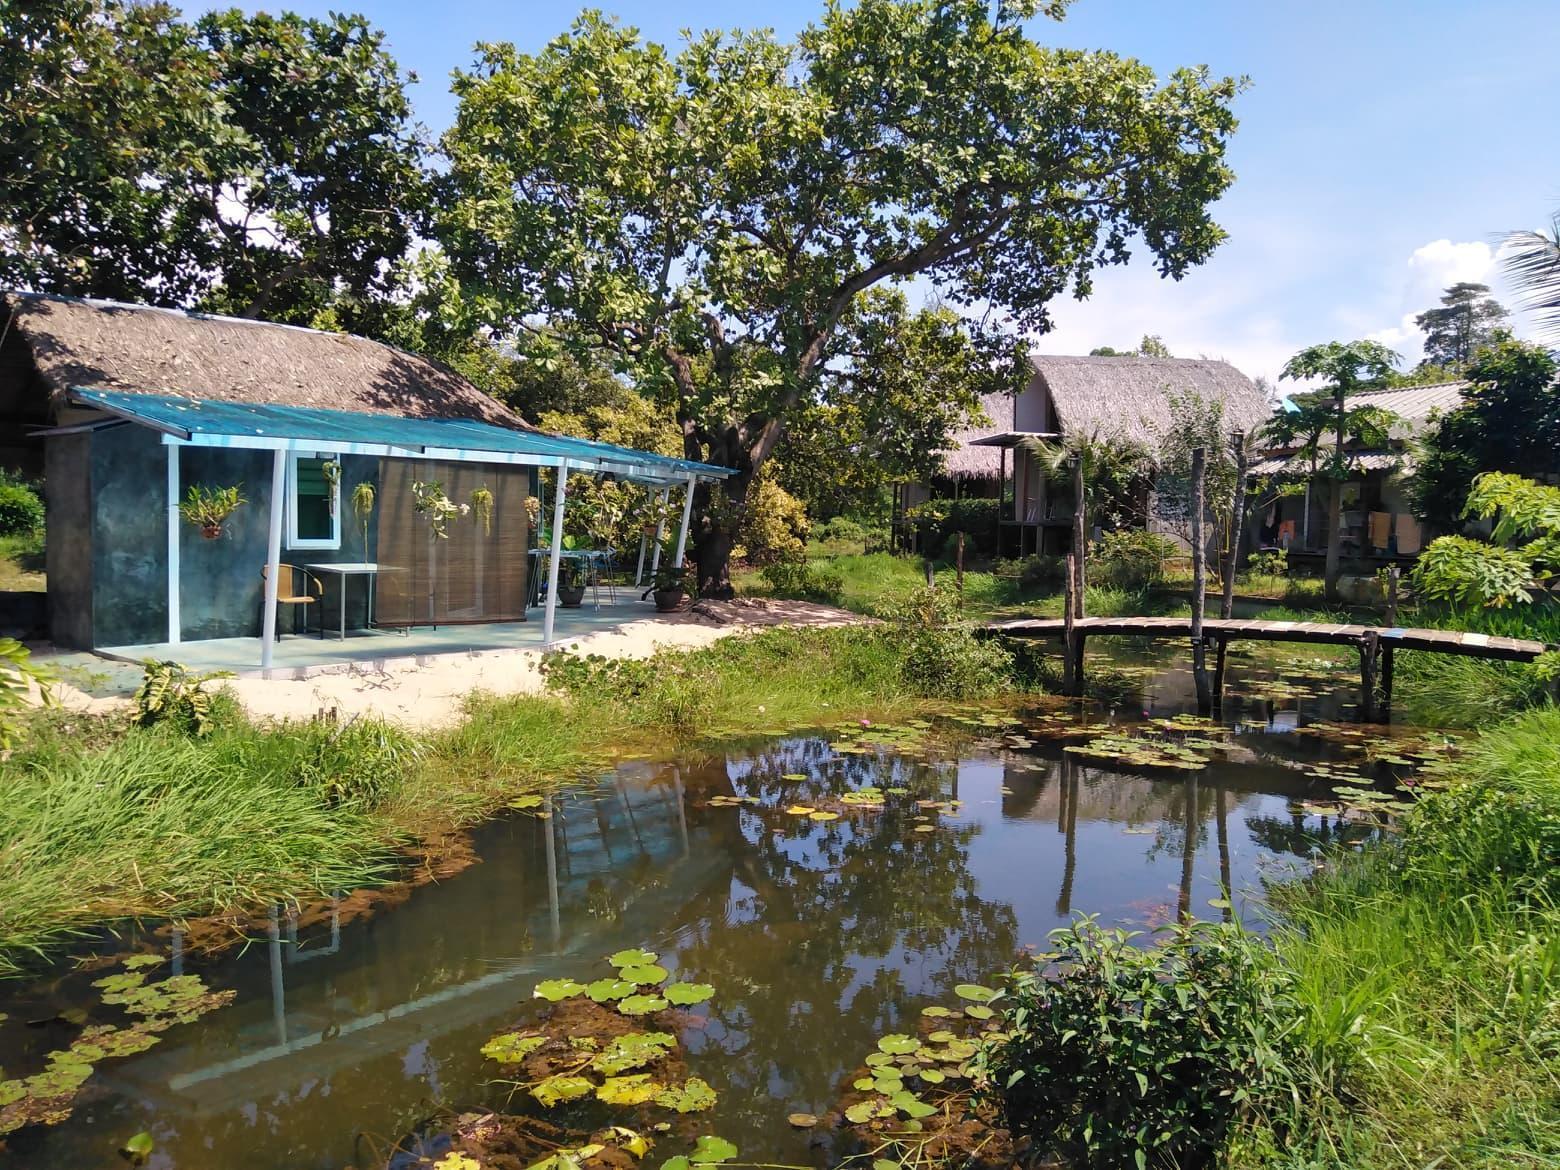 Terraria Koh Mak walks 5 minutes to Beach บังกะโล 1 ห้องนอน 1 ห้องน้ำส่วนตัว ขนาด 140 ตร.ม. – อ่าว ตา ลอง